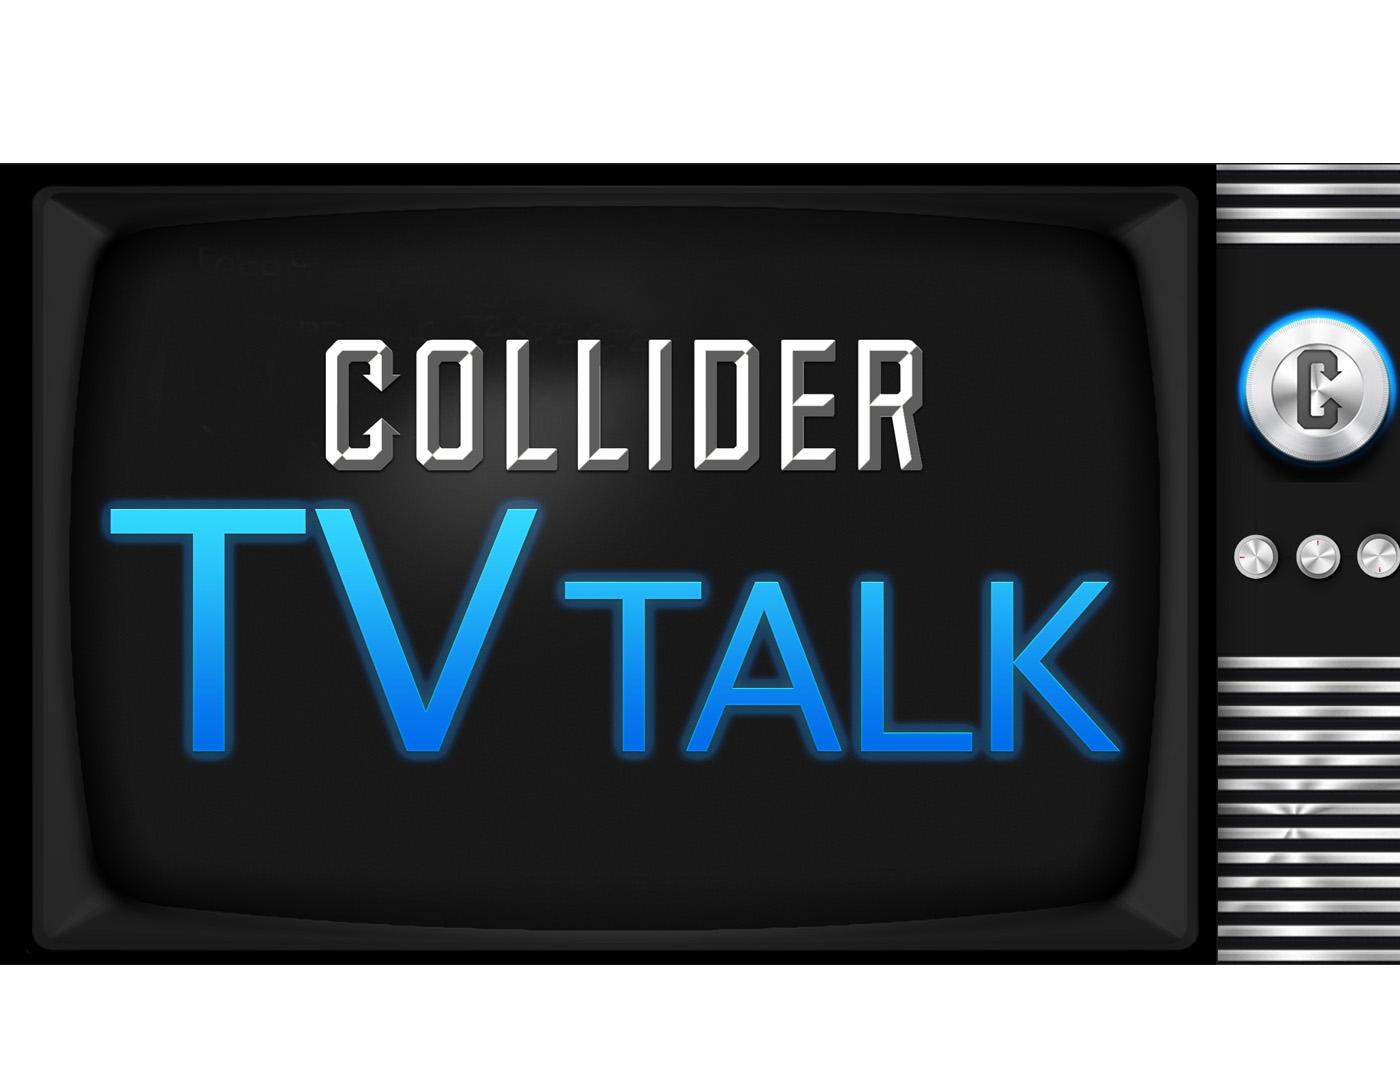 Bryan Singer to Direct X-Men Pilot, Riverdale Pilot Review - Collider TV Talk